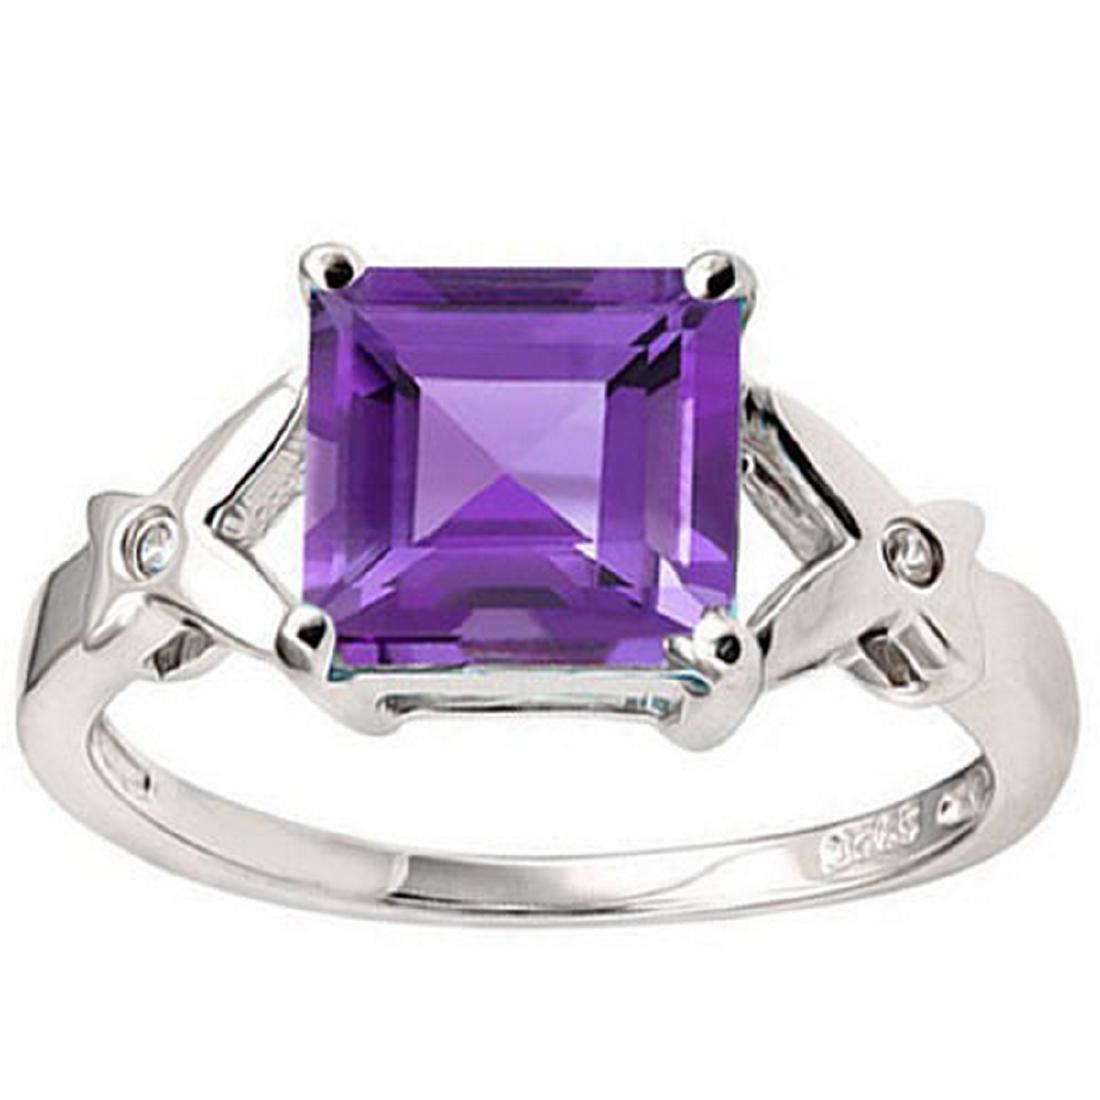 Princess Cut Amethyst Ring in Sterling Silver - 2